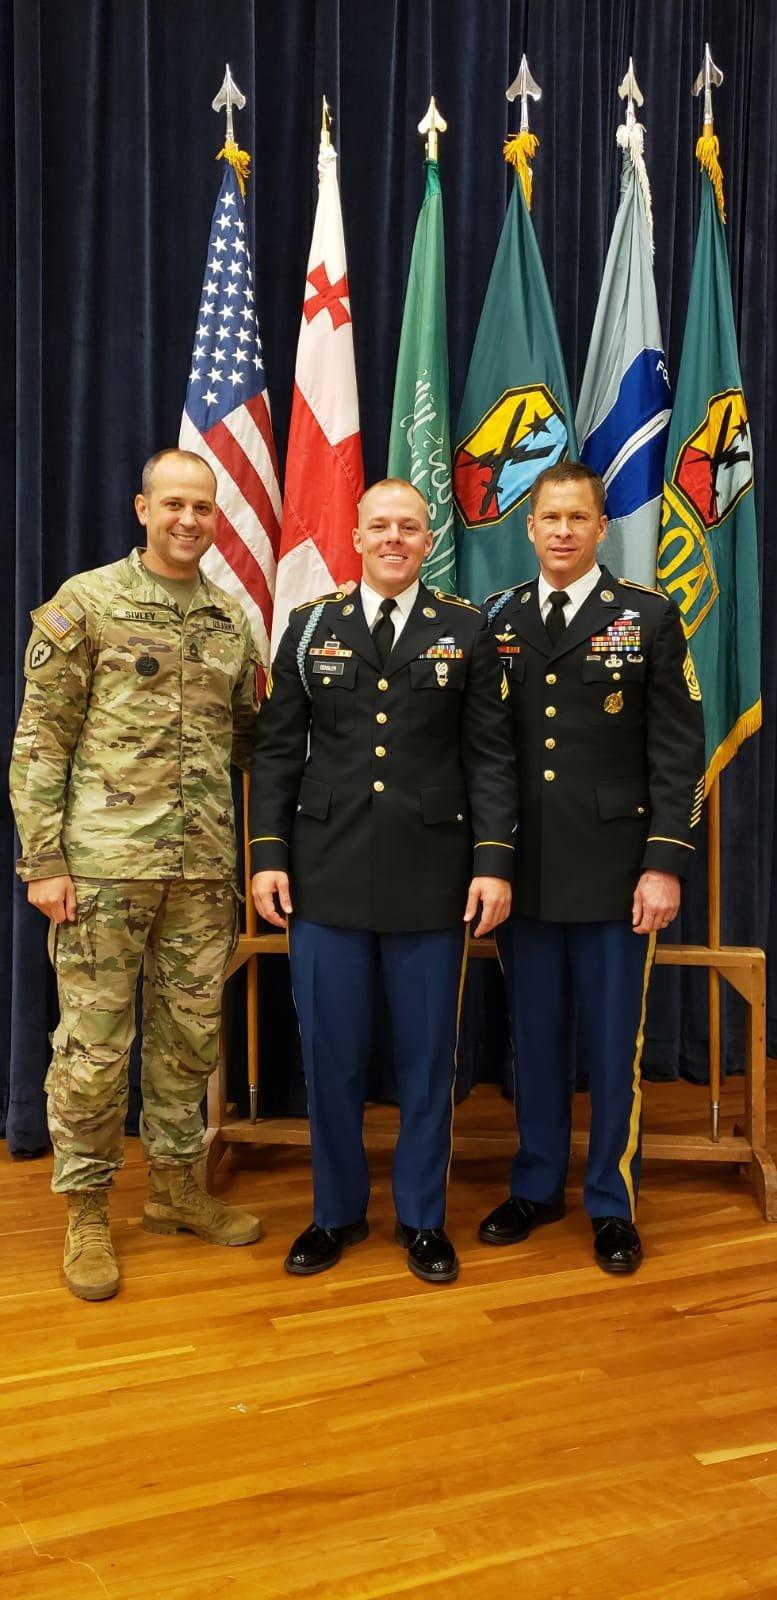 Eric Olsen - CSM, Commandant, Army | RallyPoint